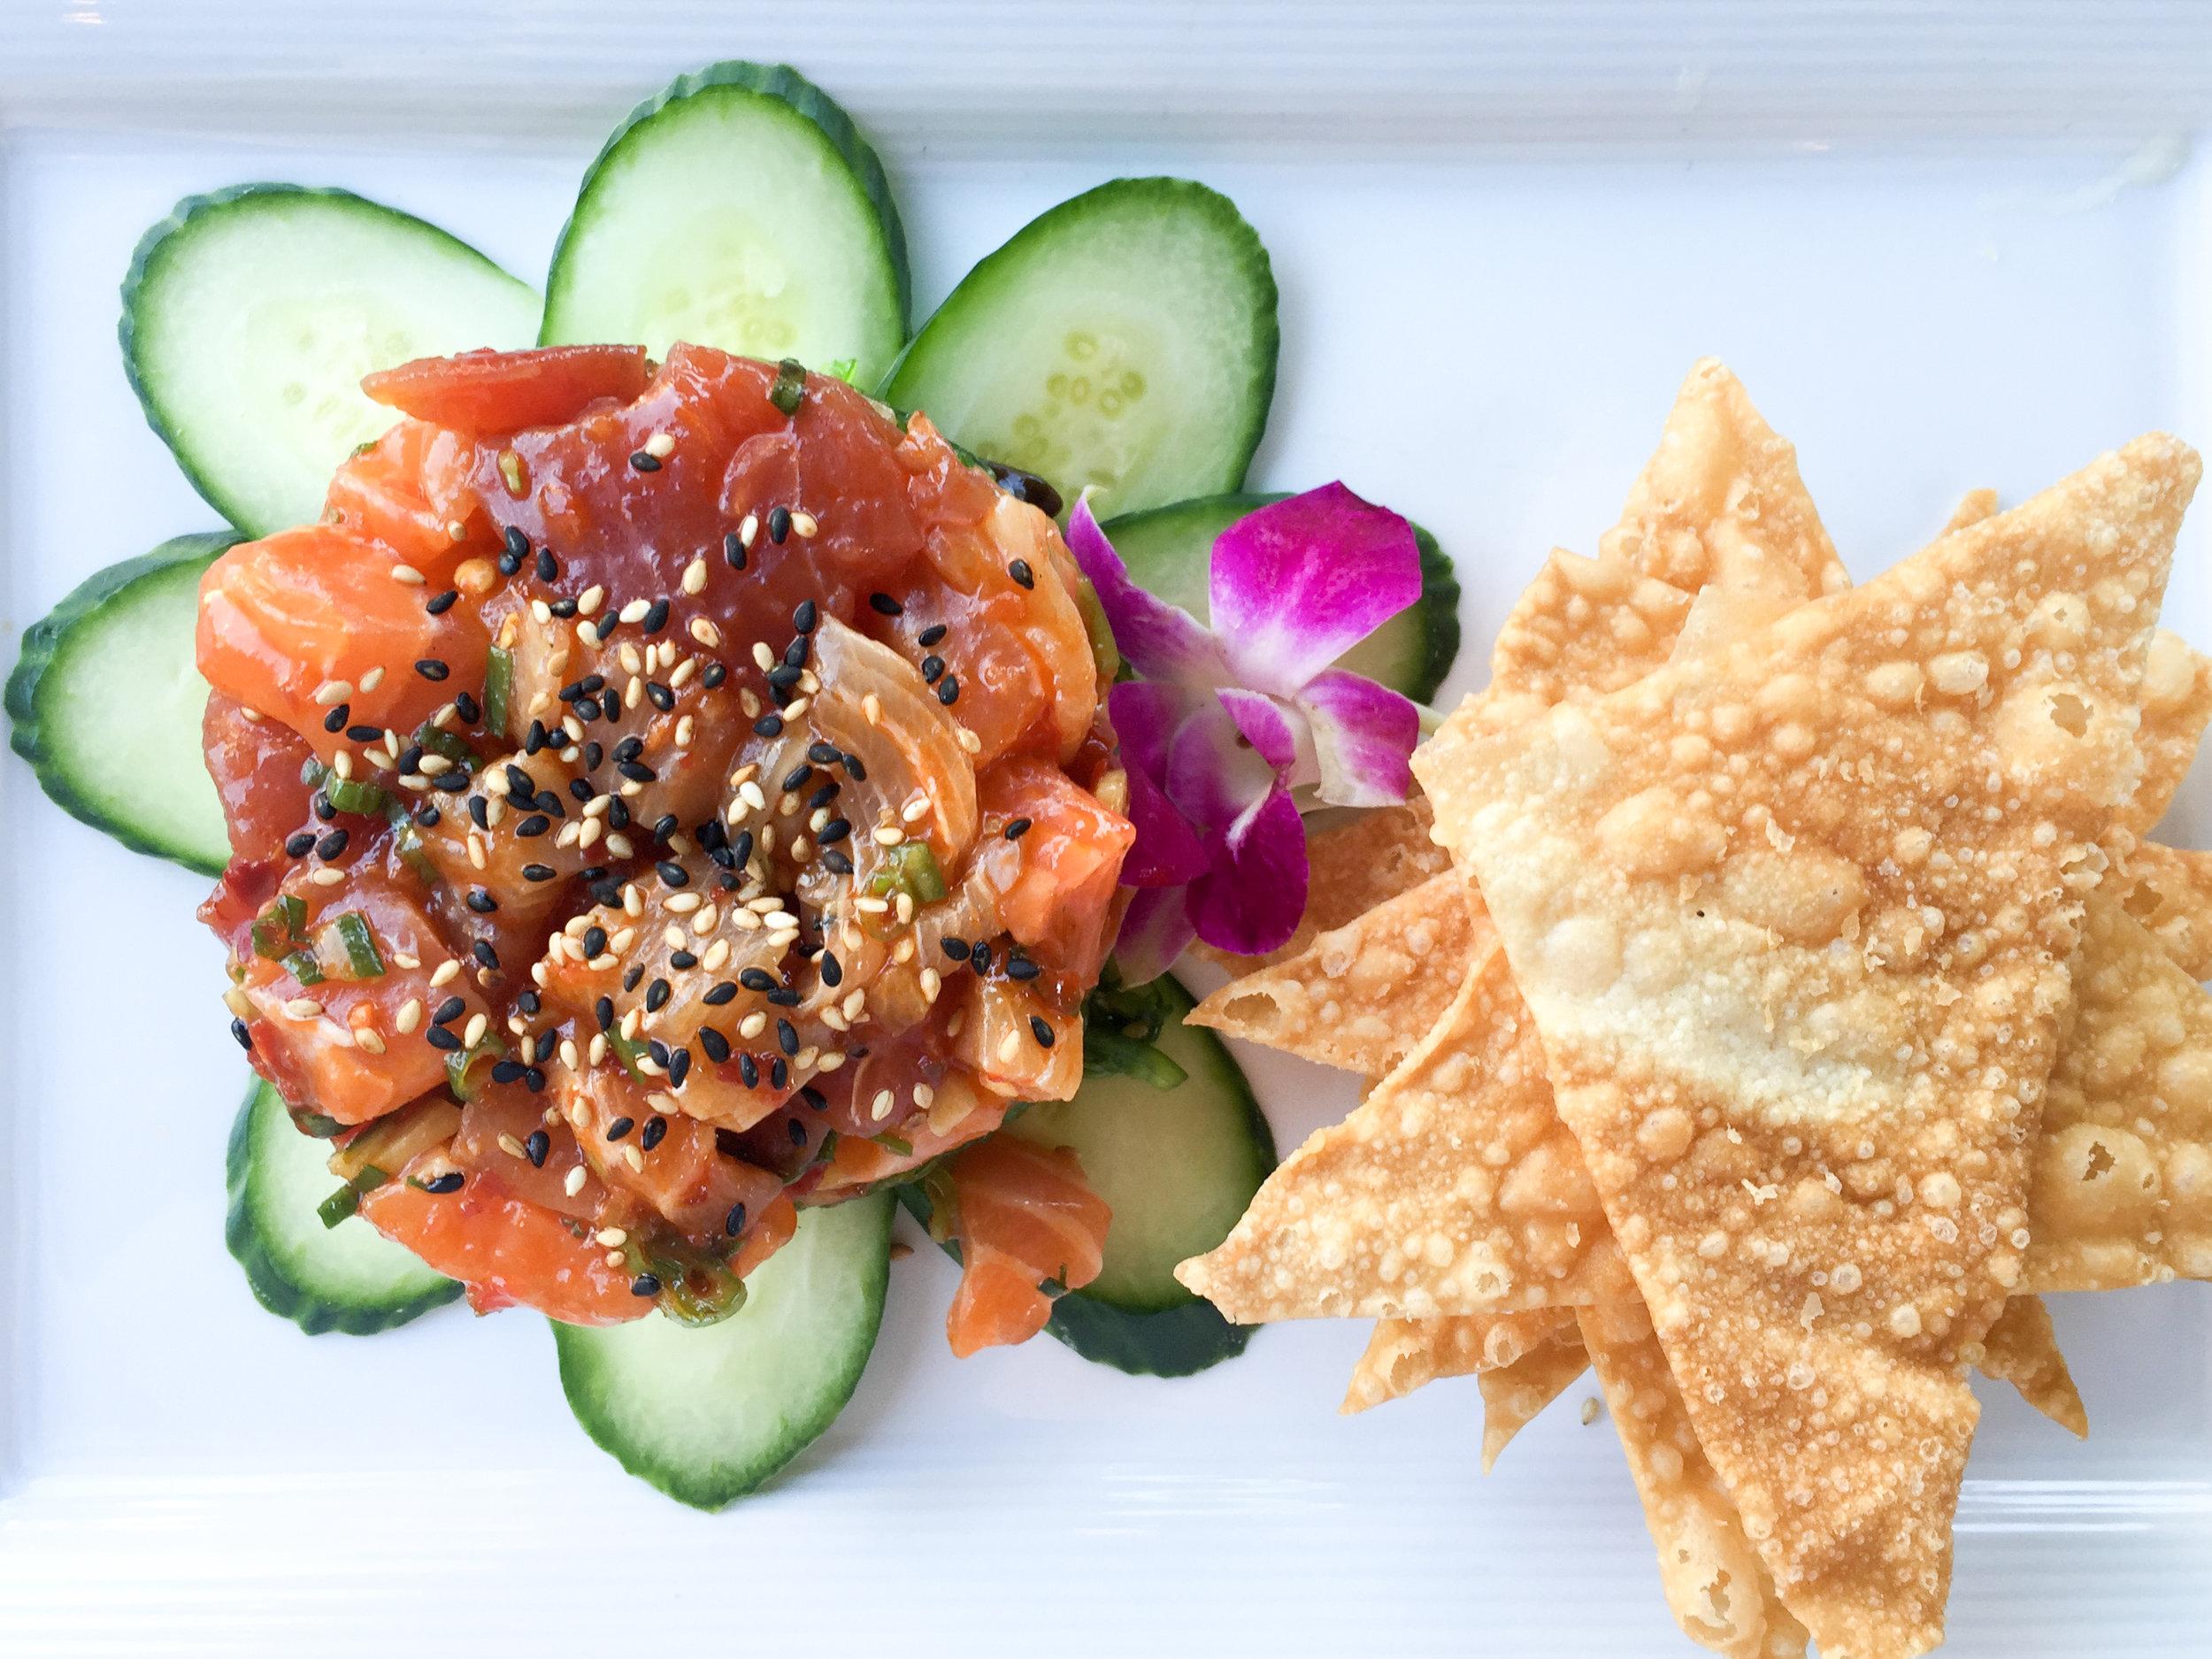 eez-fusion-sushi-huntersville-nc-spicy-poke-dip